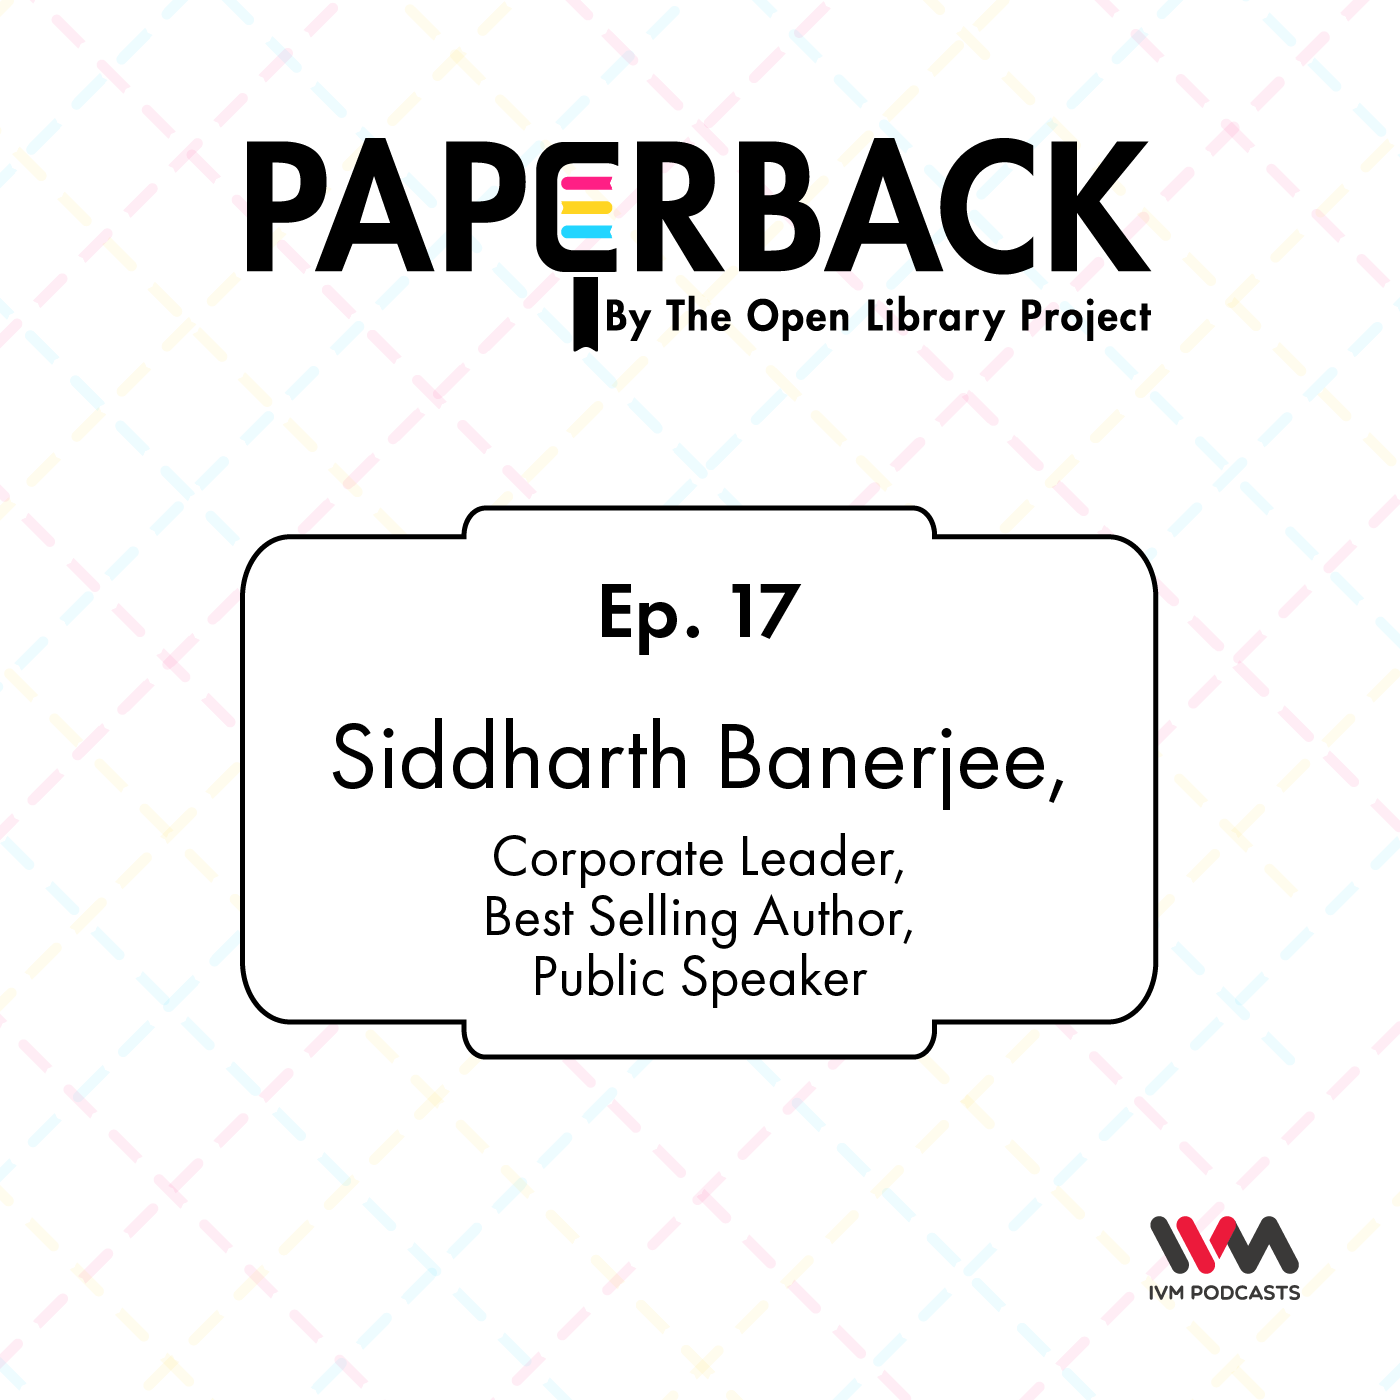 Ep. 17: Siddharth Banerjee